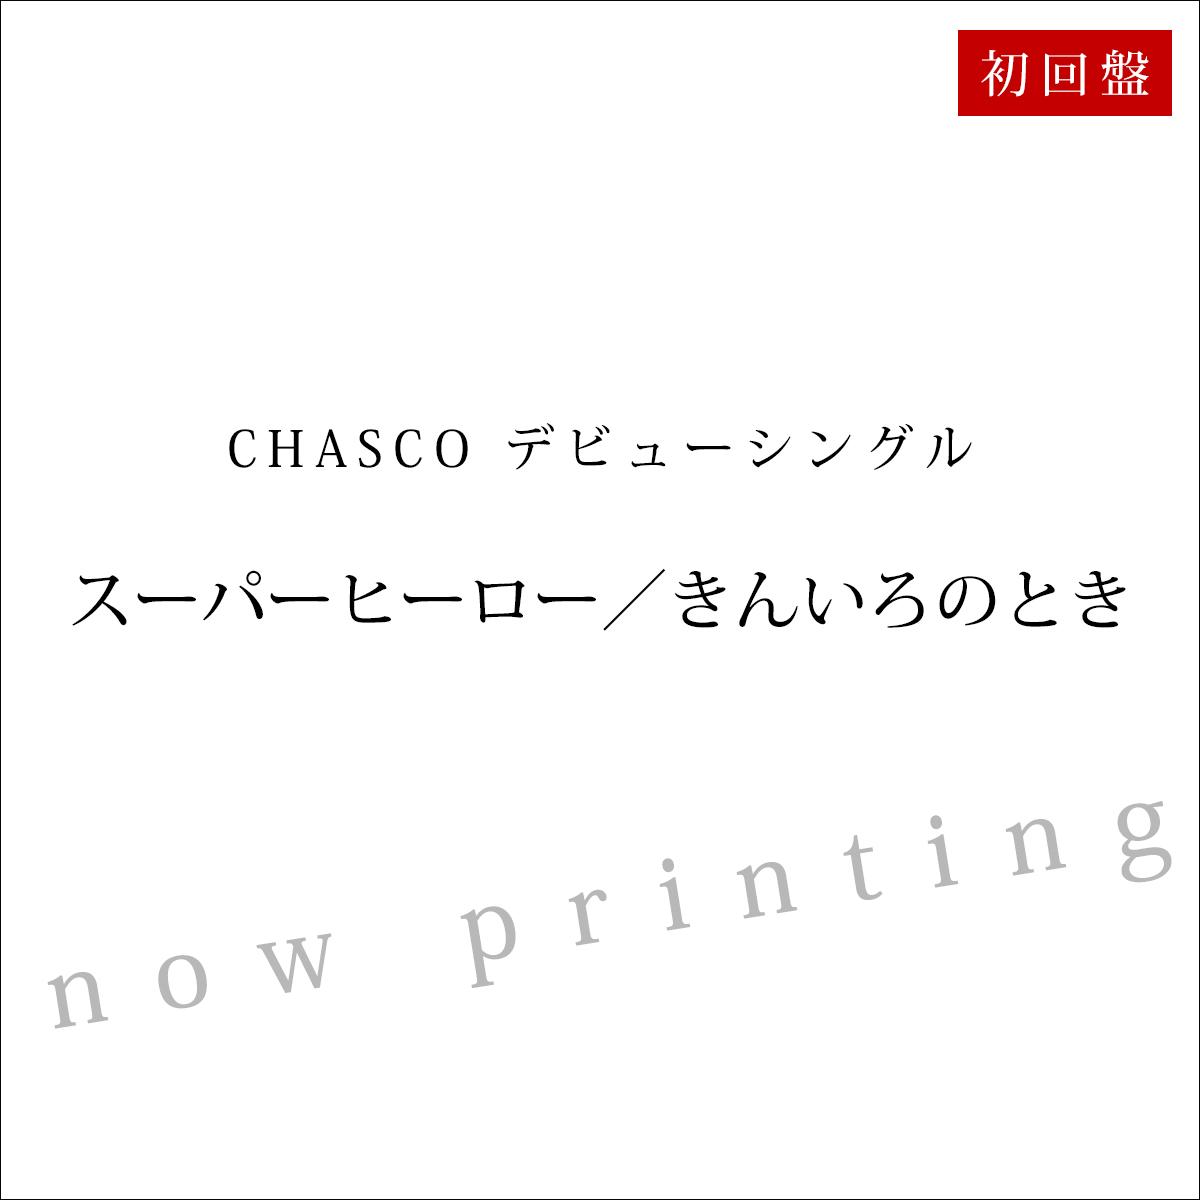 CHASCO デビューシングル『スーパーヒーロー/きんいろのとき』初回盤